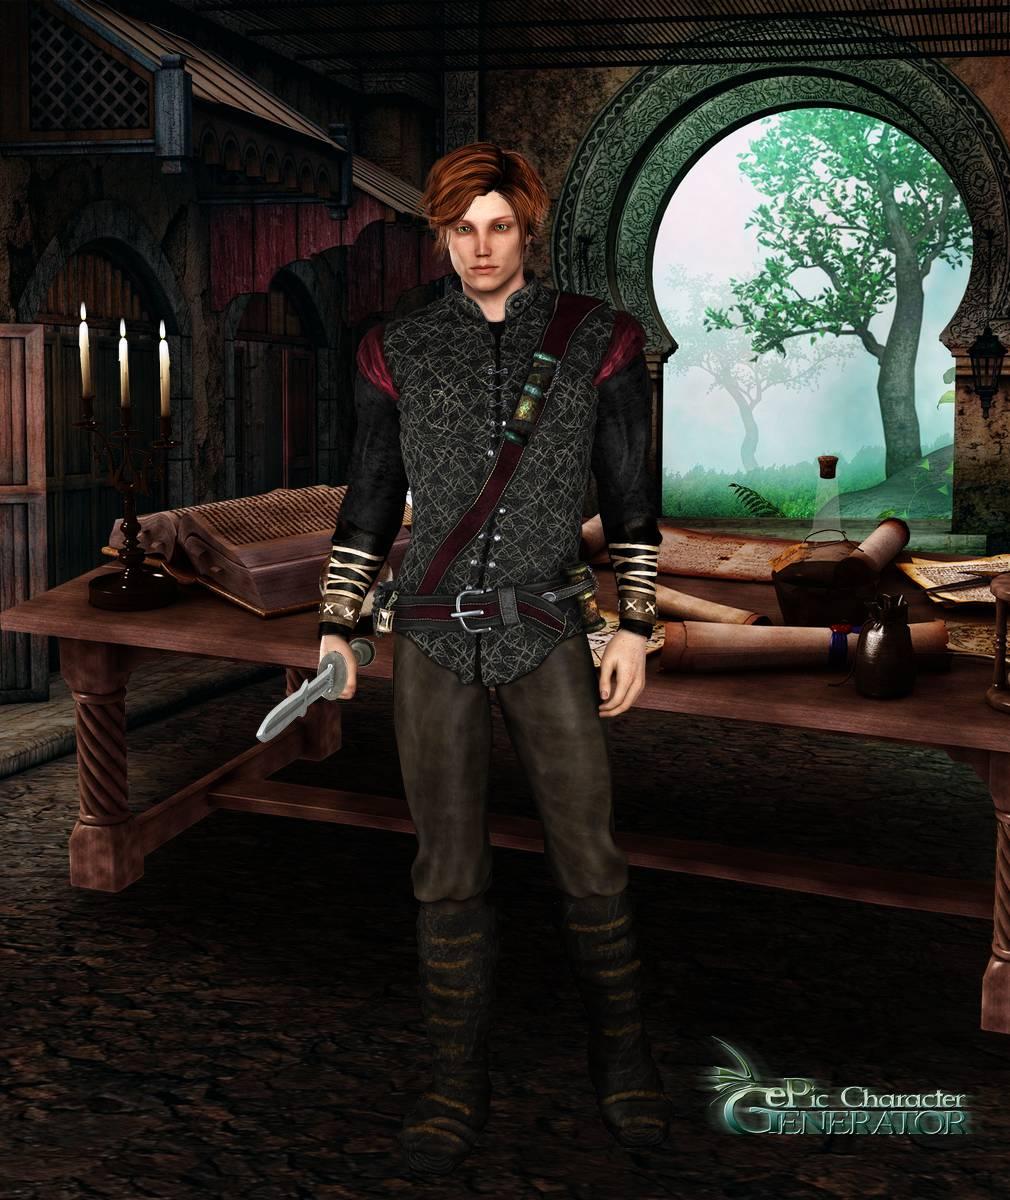 ePic Character Generator Season 2 Male Adventurer Screenshot 08